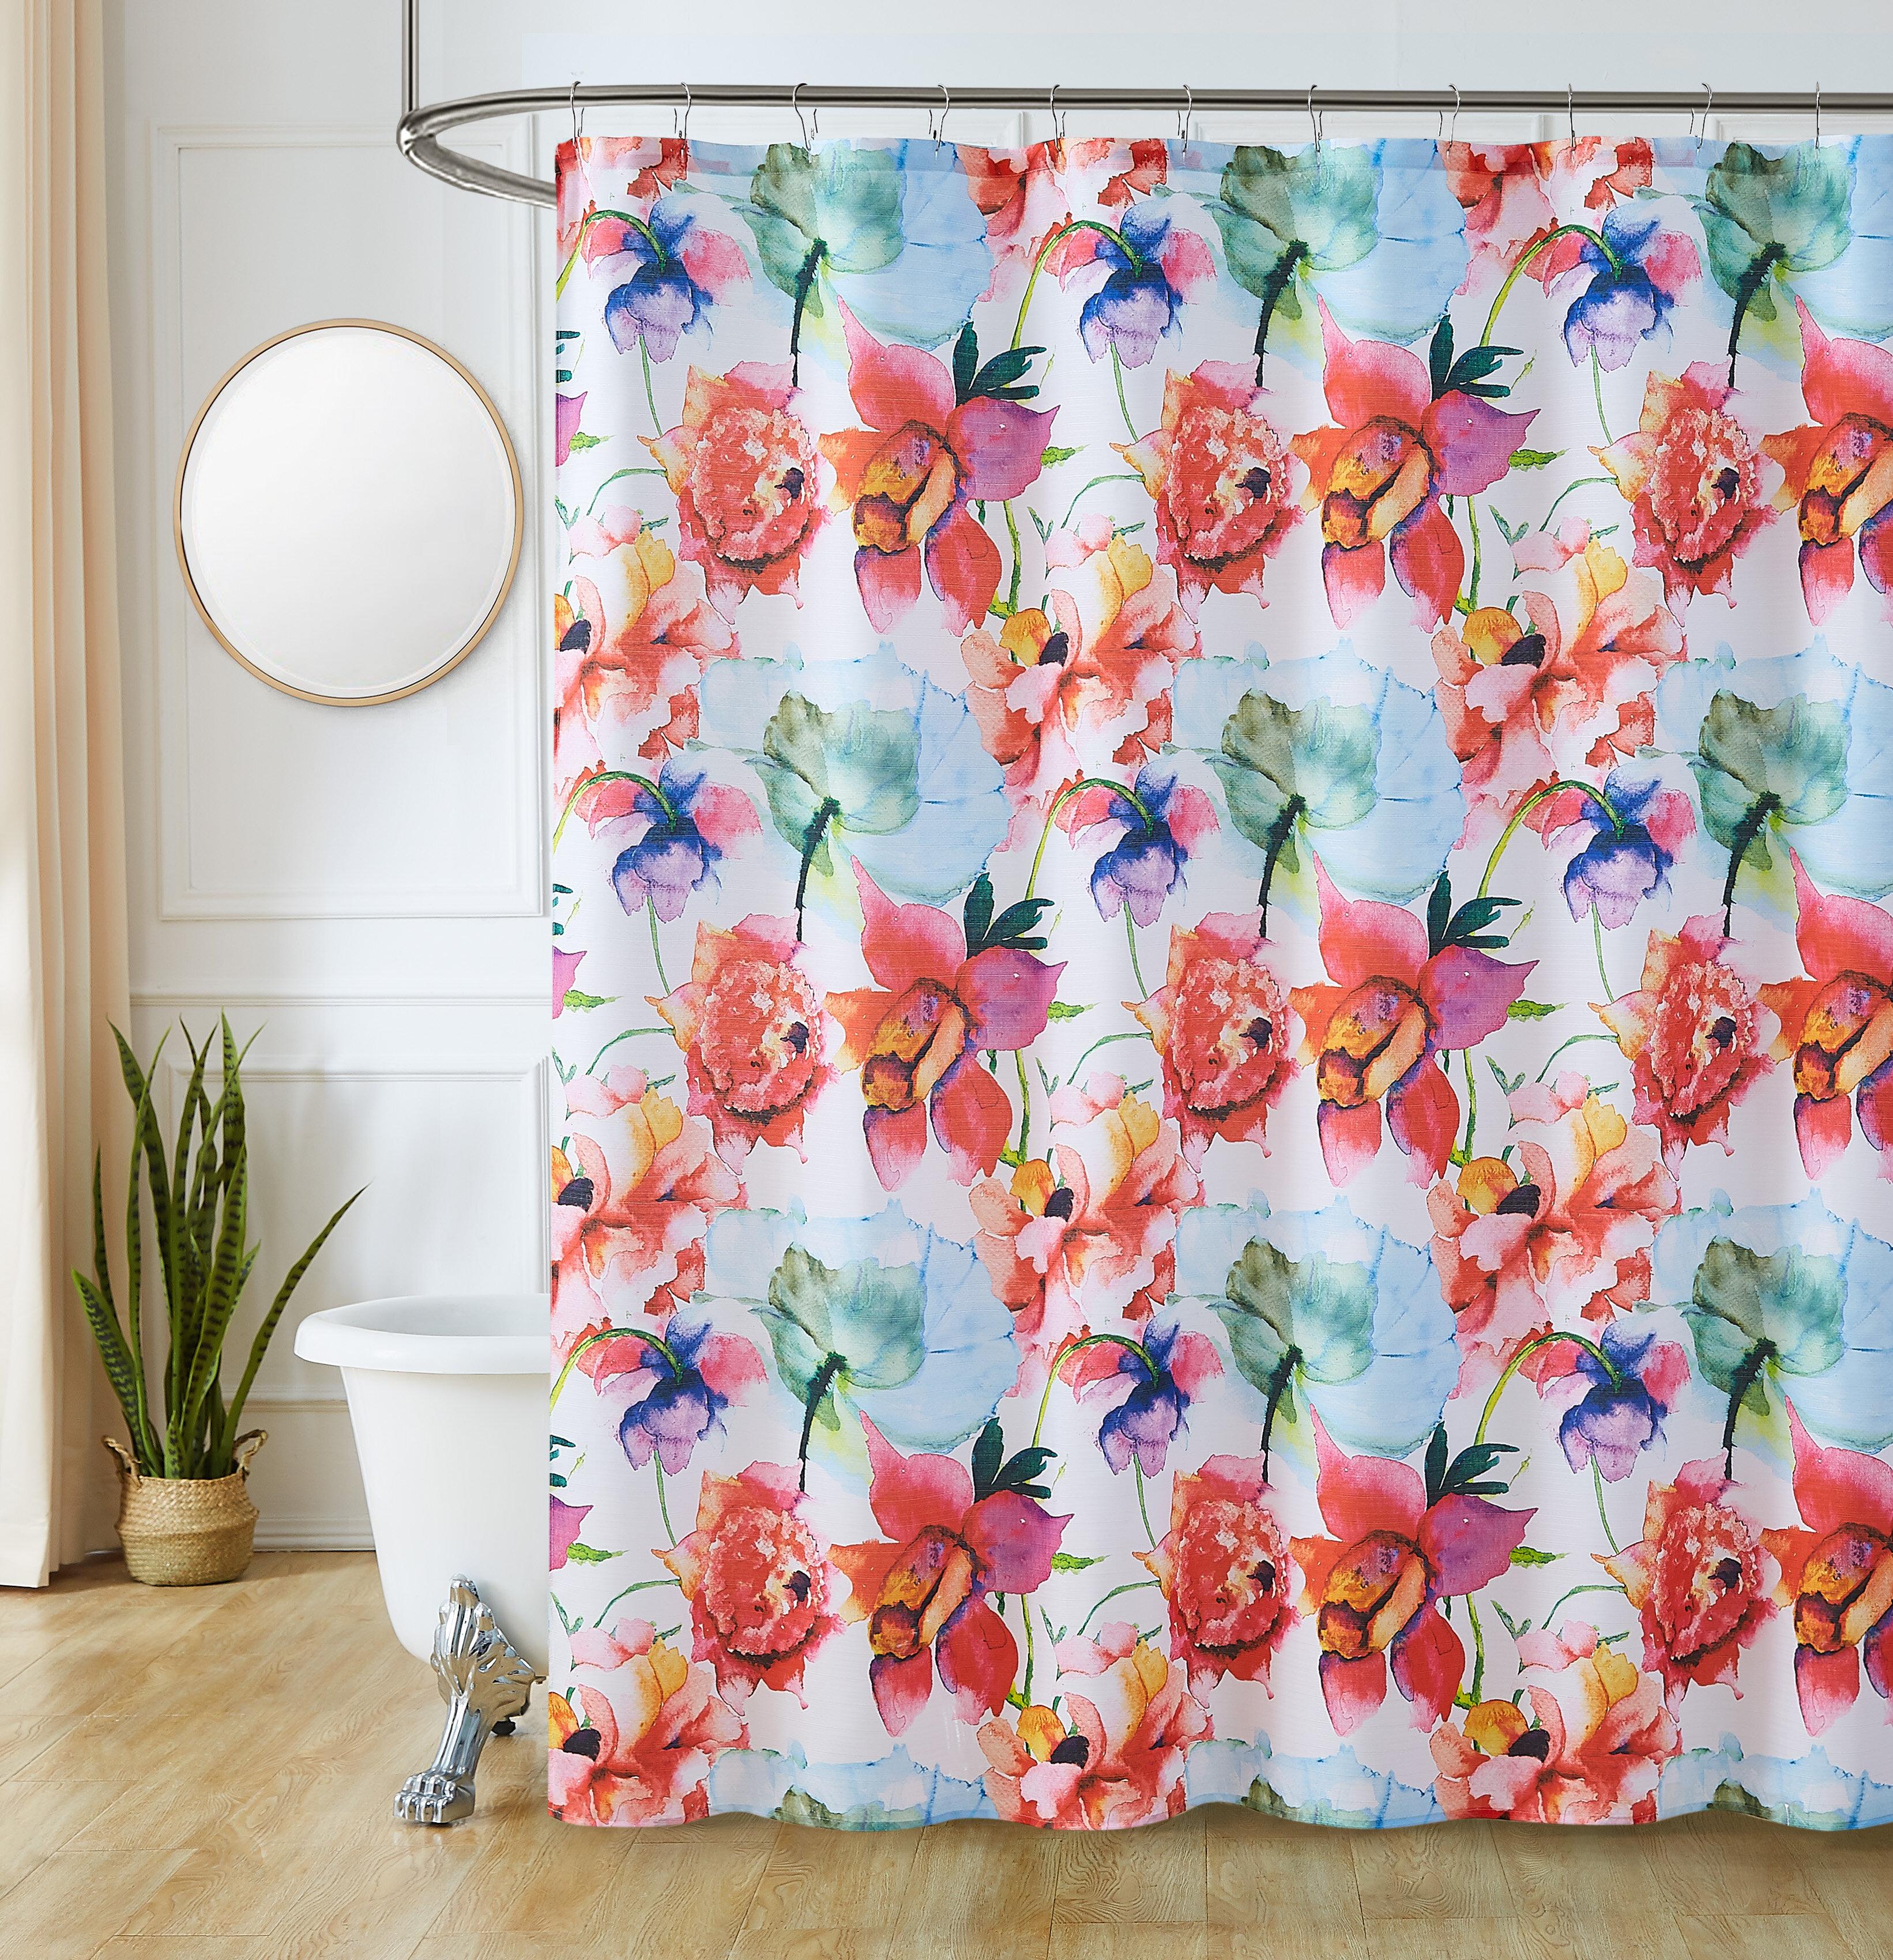 Red Barrel Studio Aletheia 13 Piece Floral Shower Curtain Set Hooks Wayfair